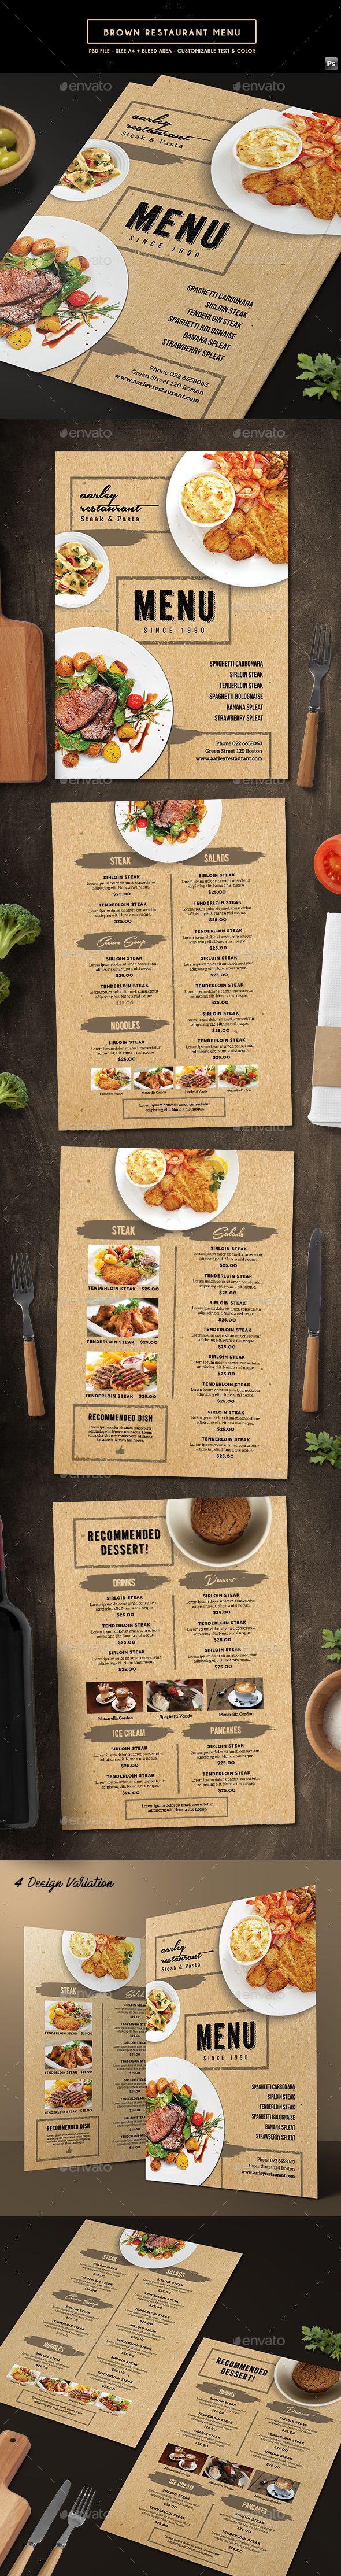 Brown Restaurant Menu | Restaurante, Menus restaurantes y Marisqueria